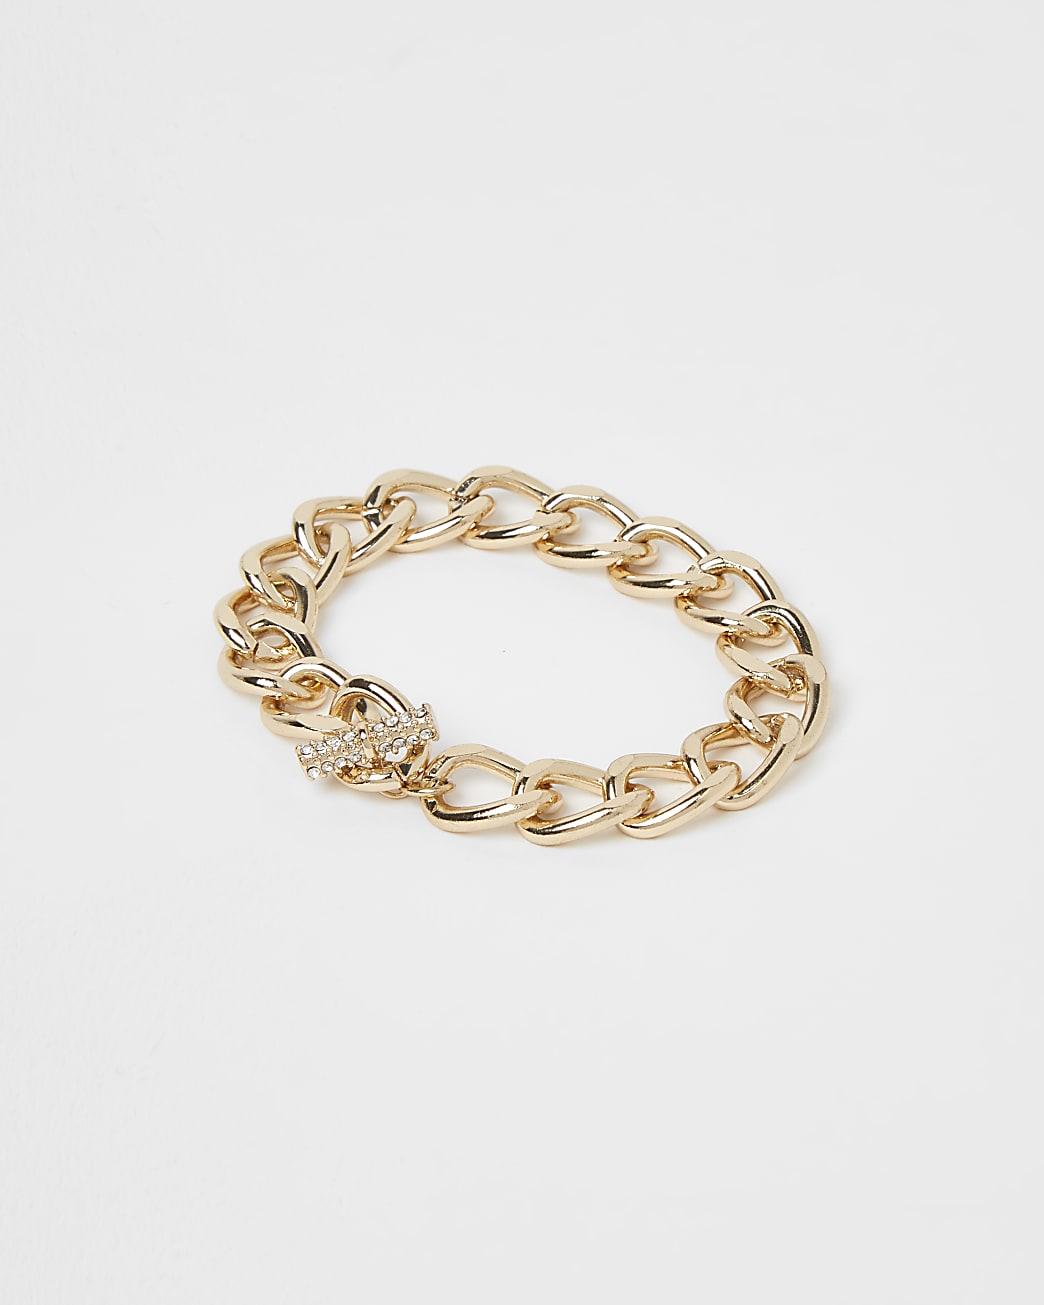 Gold chunky chain link bracelet